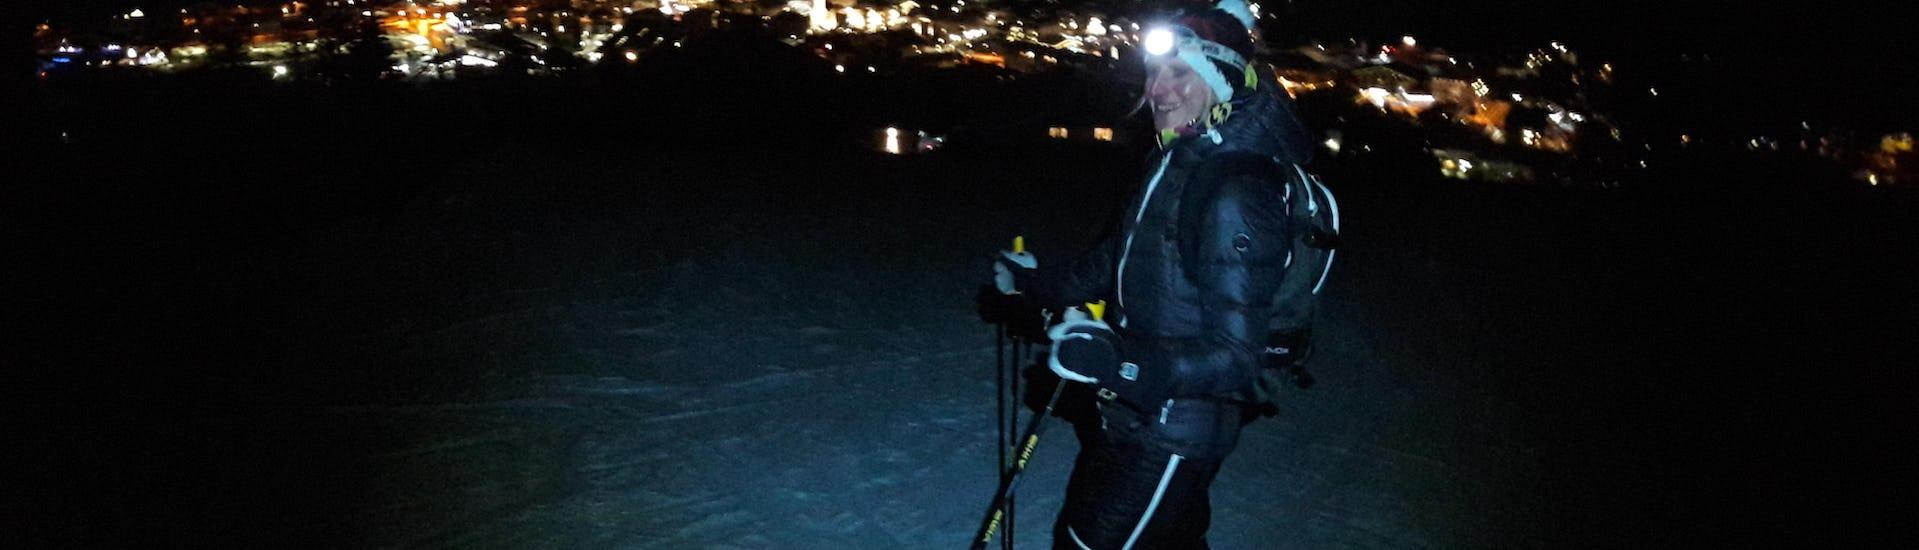 Ski Touring by night Kaprun / Maiskogel